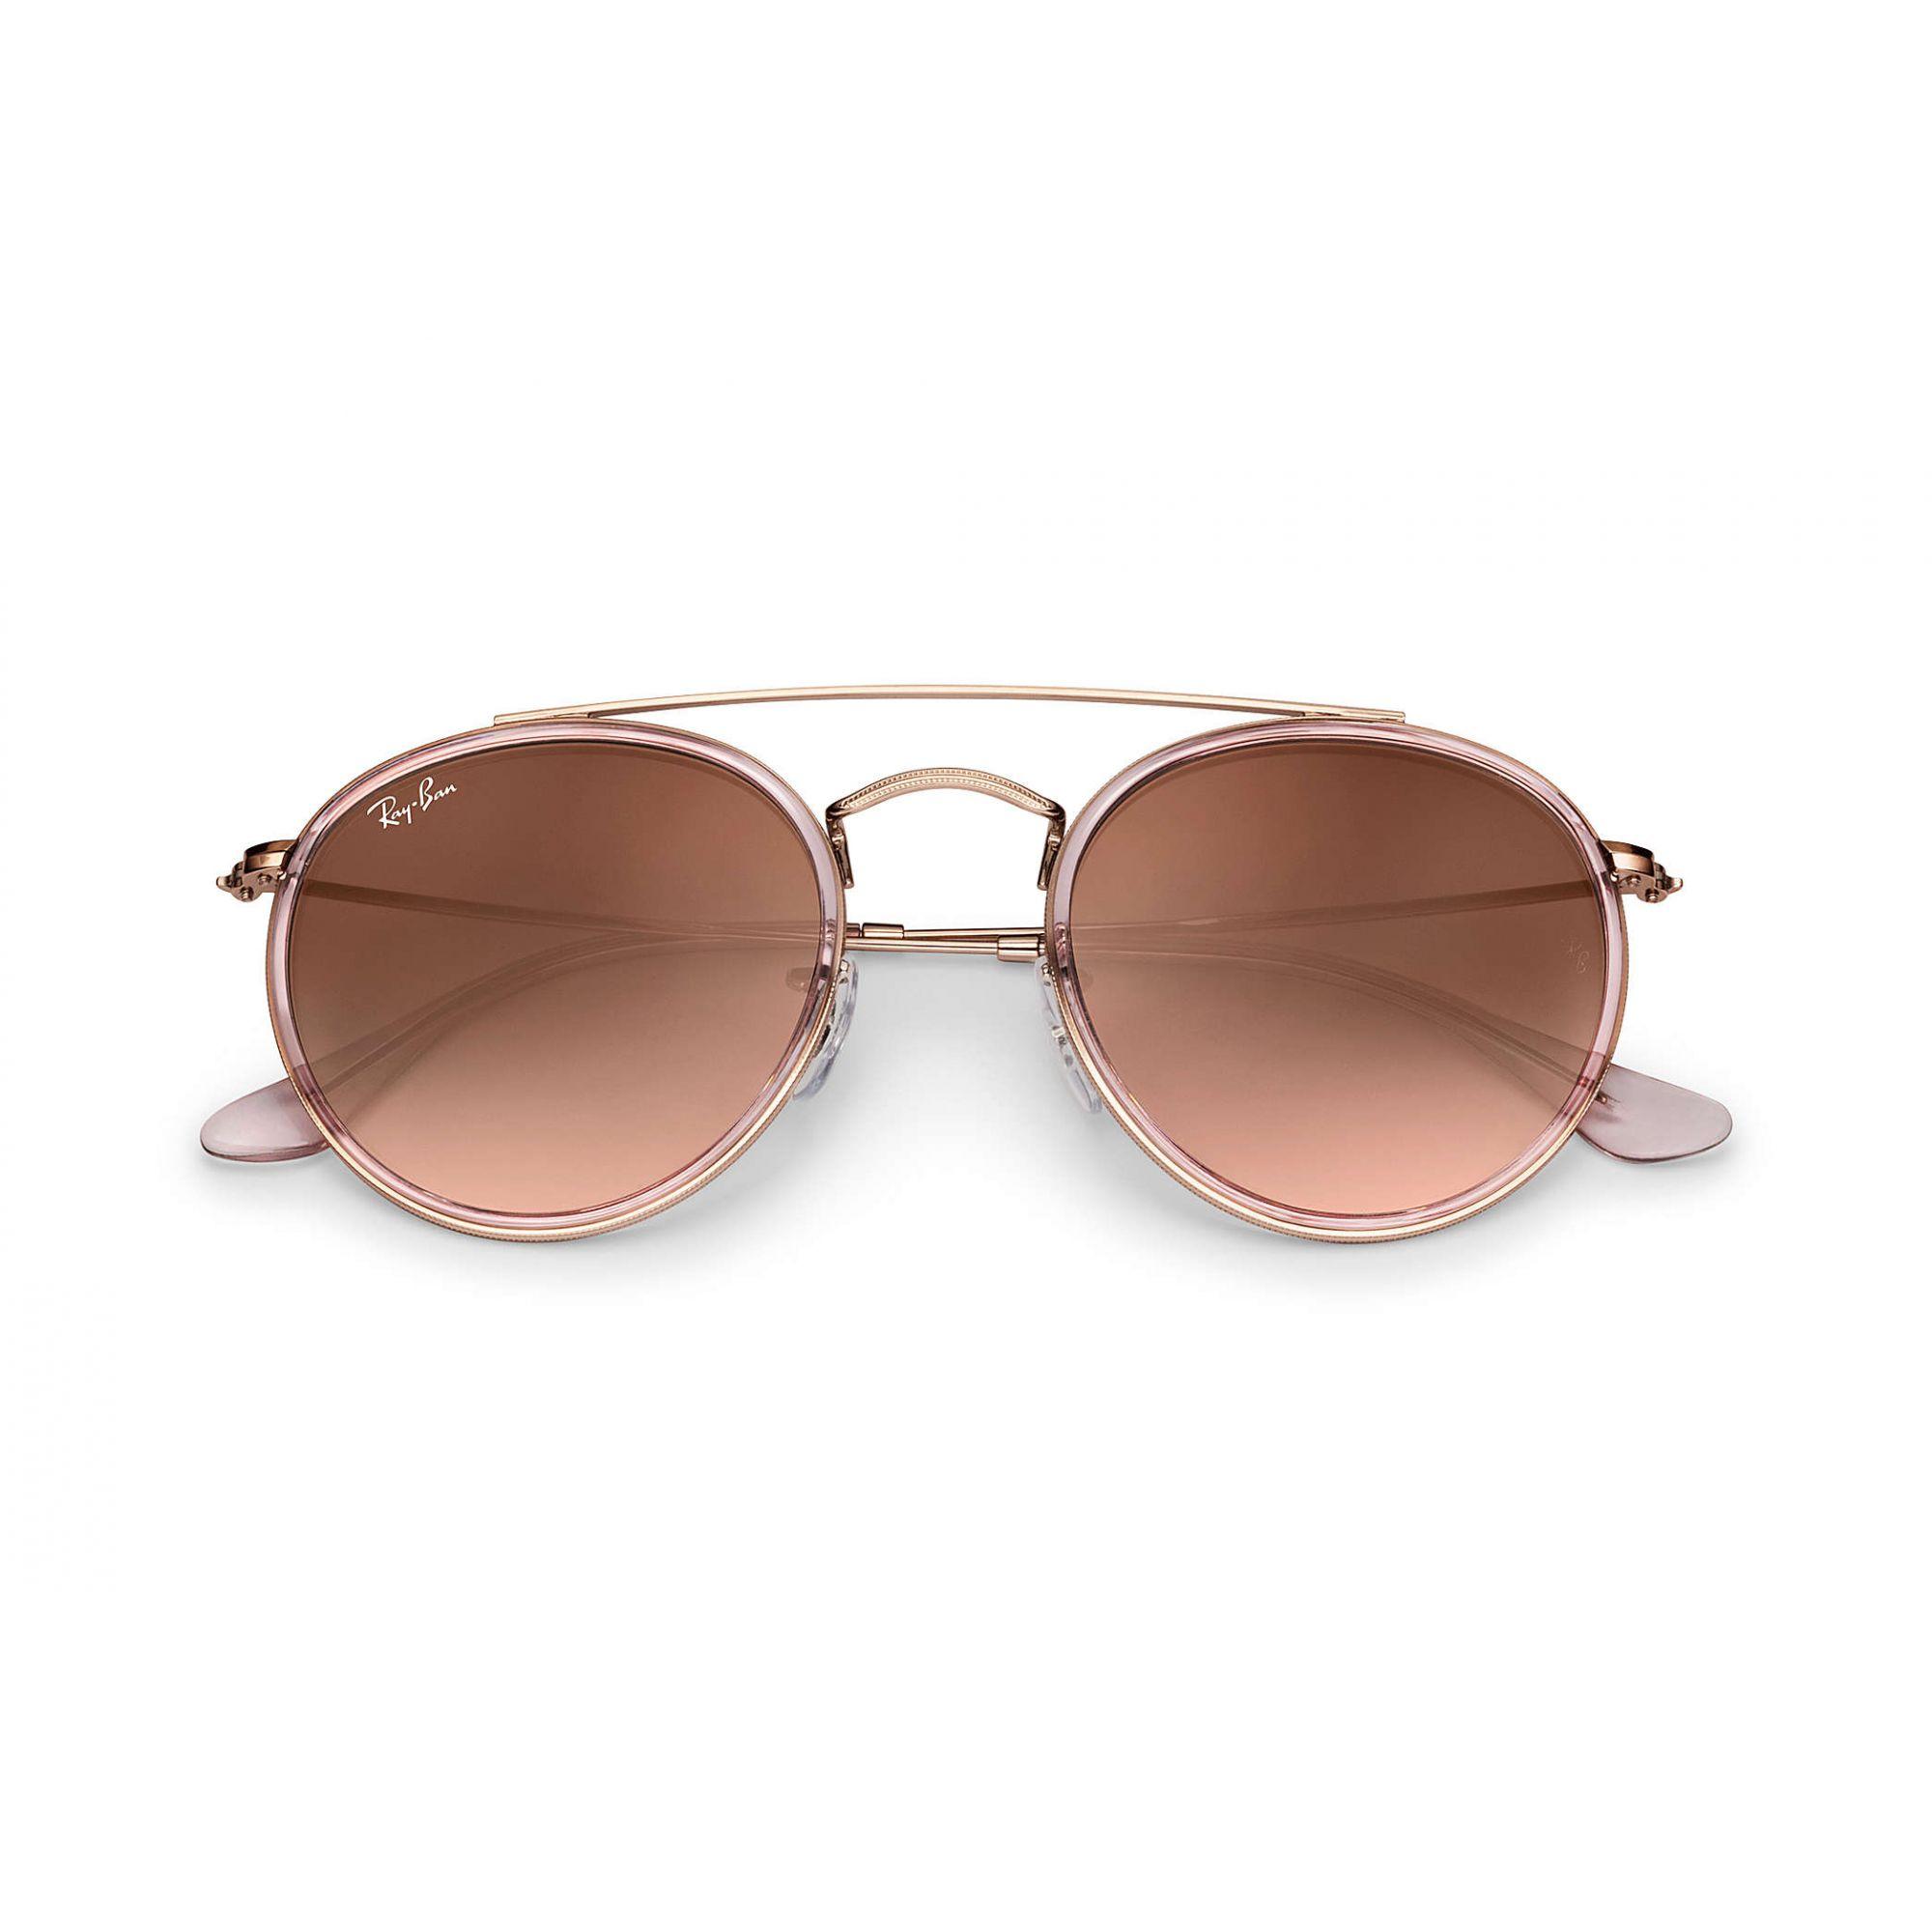 Ray Ban - RB3647N 9069A551 - Óculos de sol